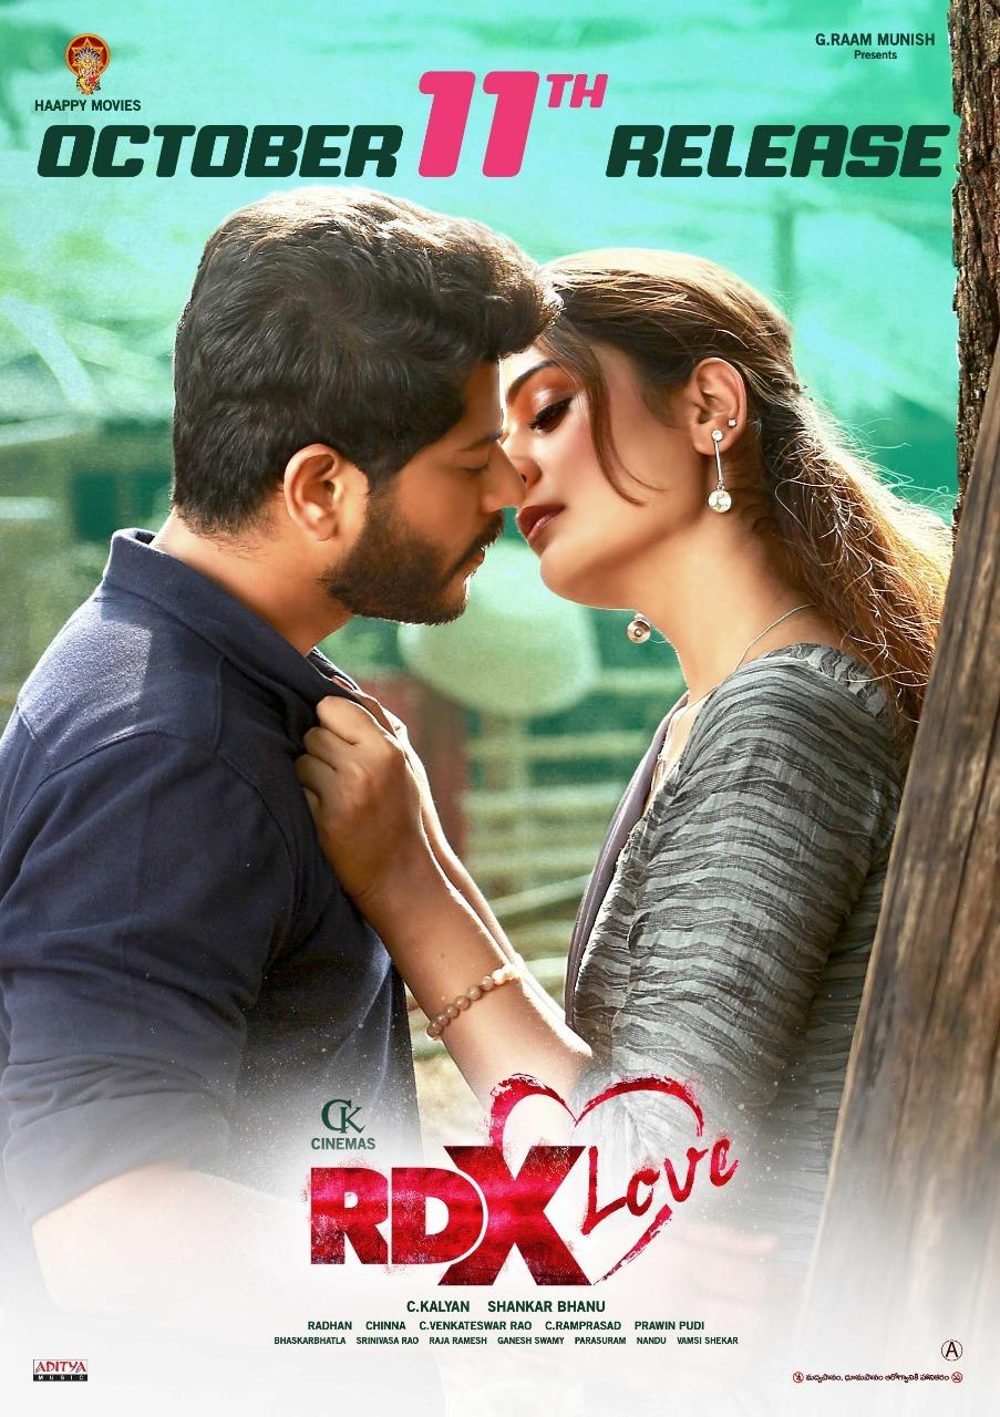 Tejus Kancherla Payal Rajput RDX Love movie release date on October 11th